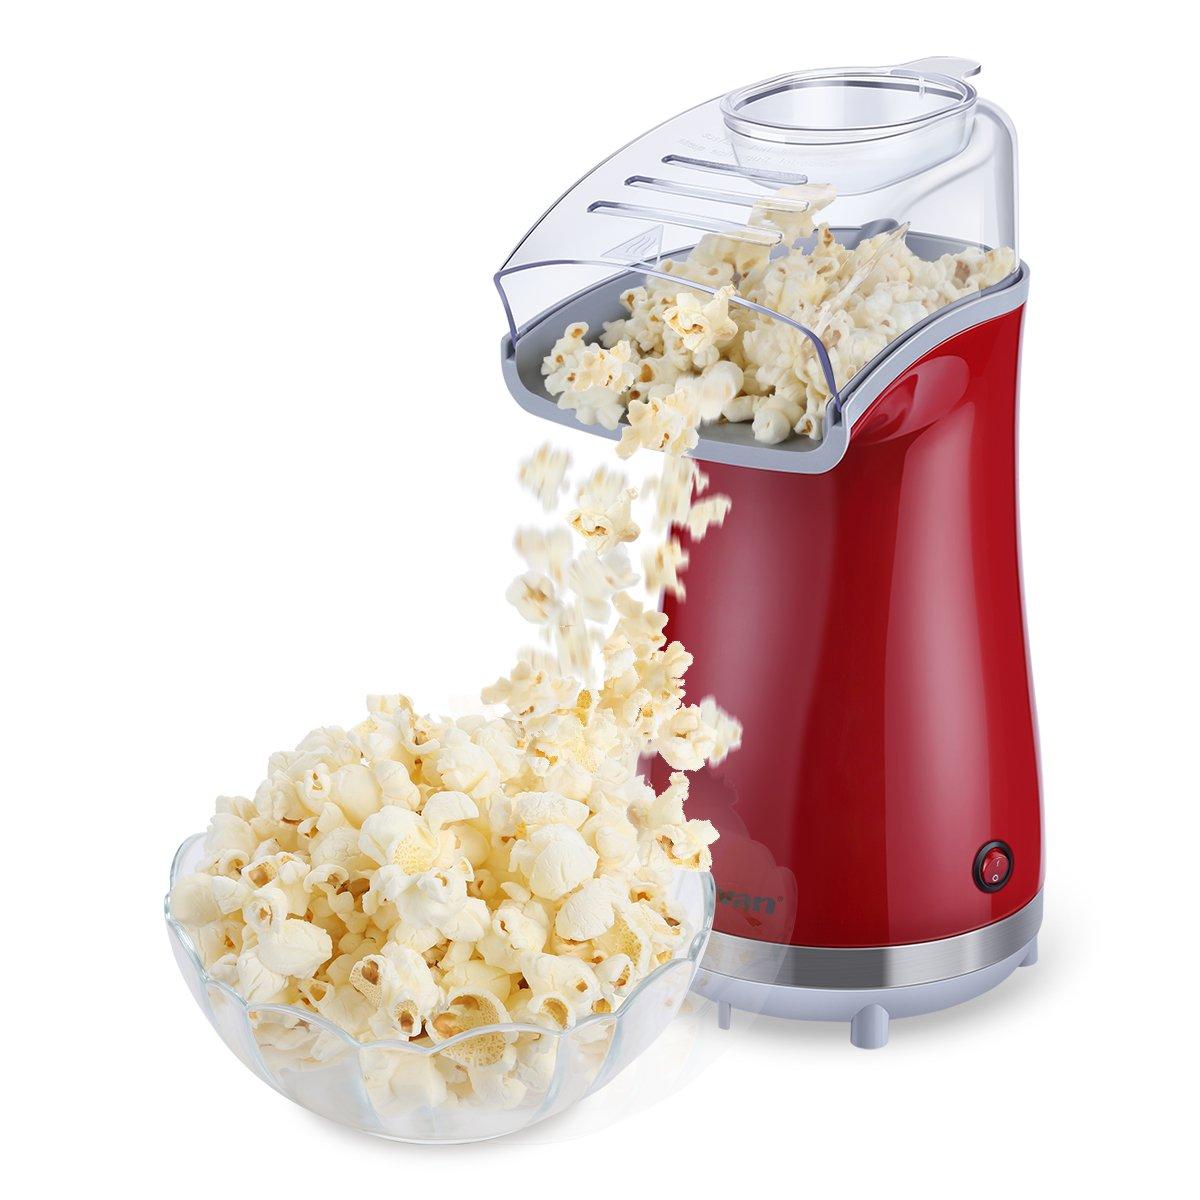 Amazon Excelvan Hot Air Popcorn Popper Electric Machine Maker